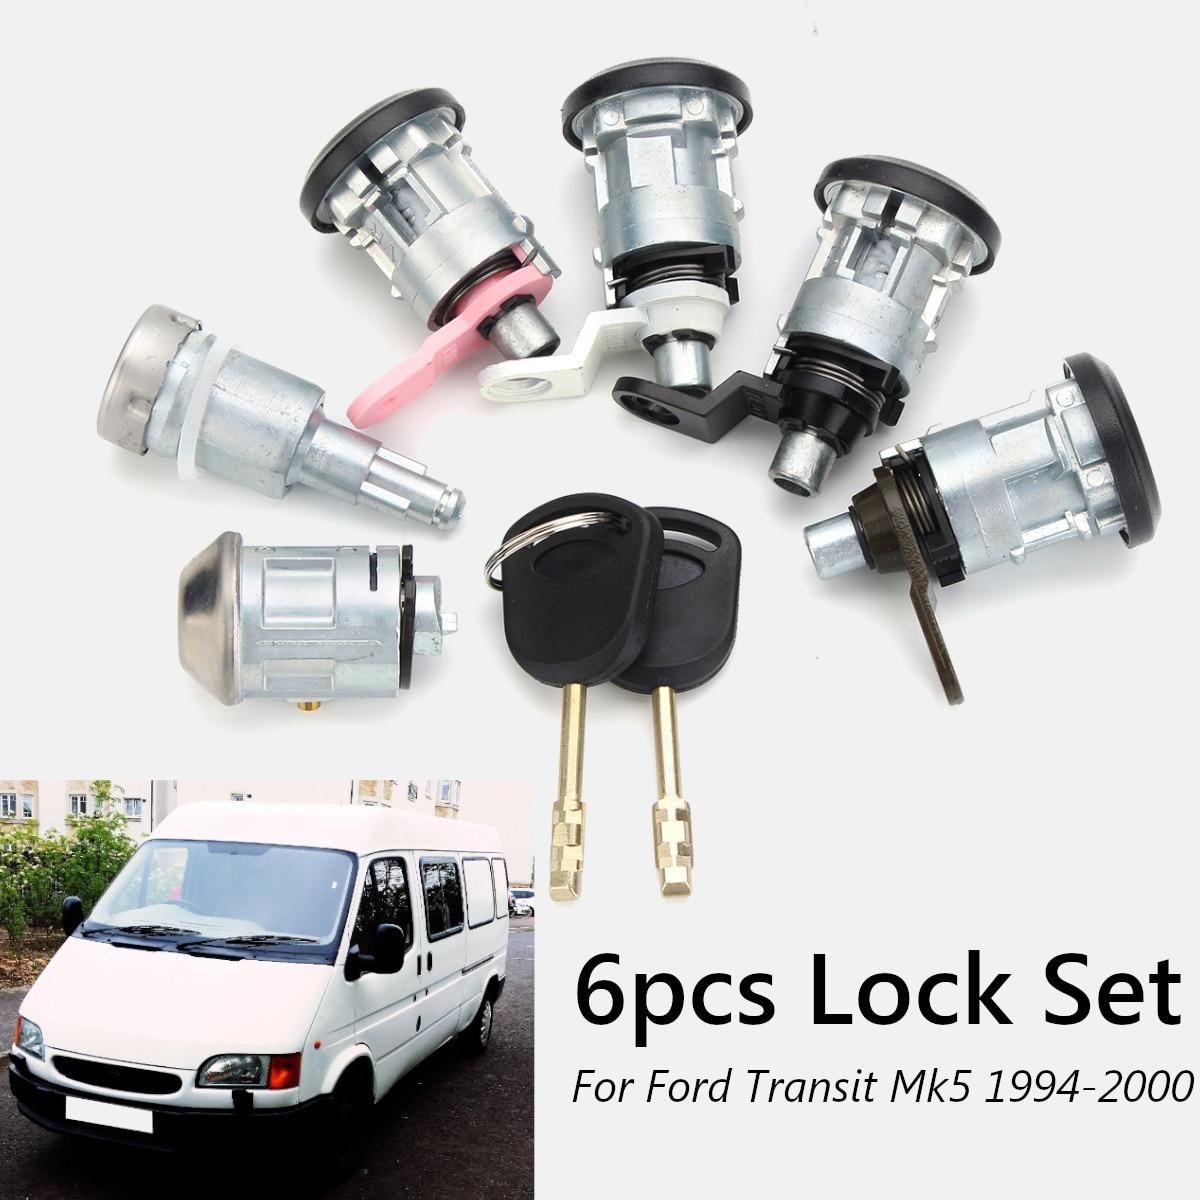 6Pcs Full Left Right Lock Set Front Rear Door Ignition W/2 Keys For Ford Transit Mk5 1994-2000